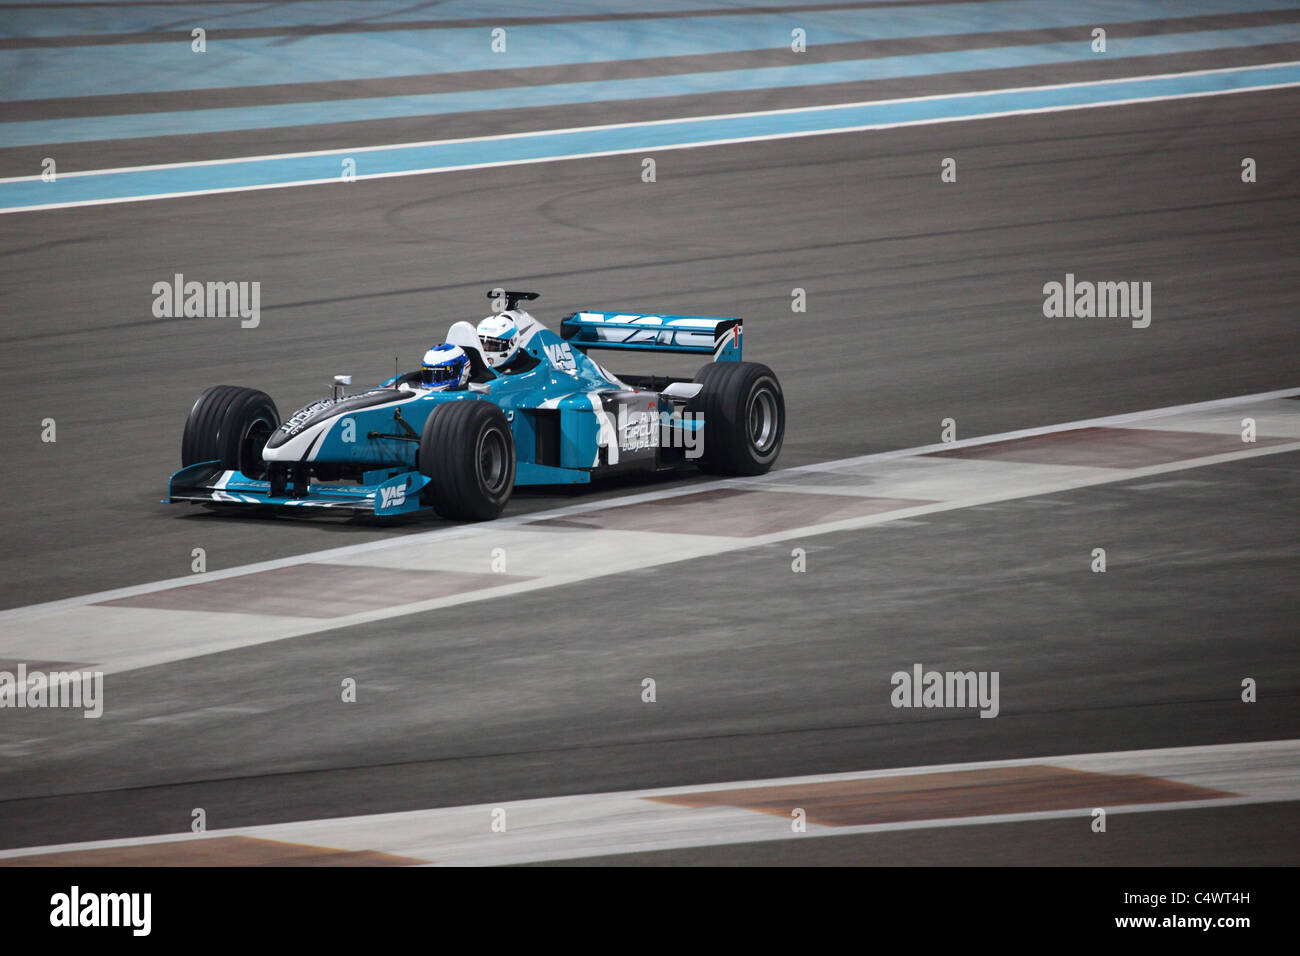 Racing Car at Yas Marina Formula 1 Racing Track in Abu Dhabi - Stock Image